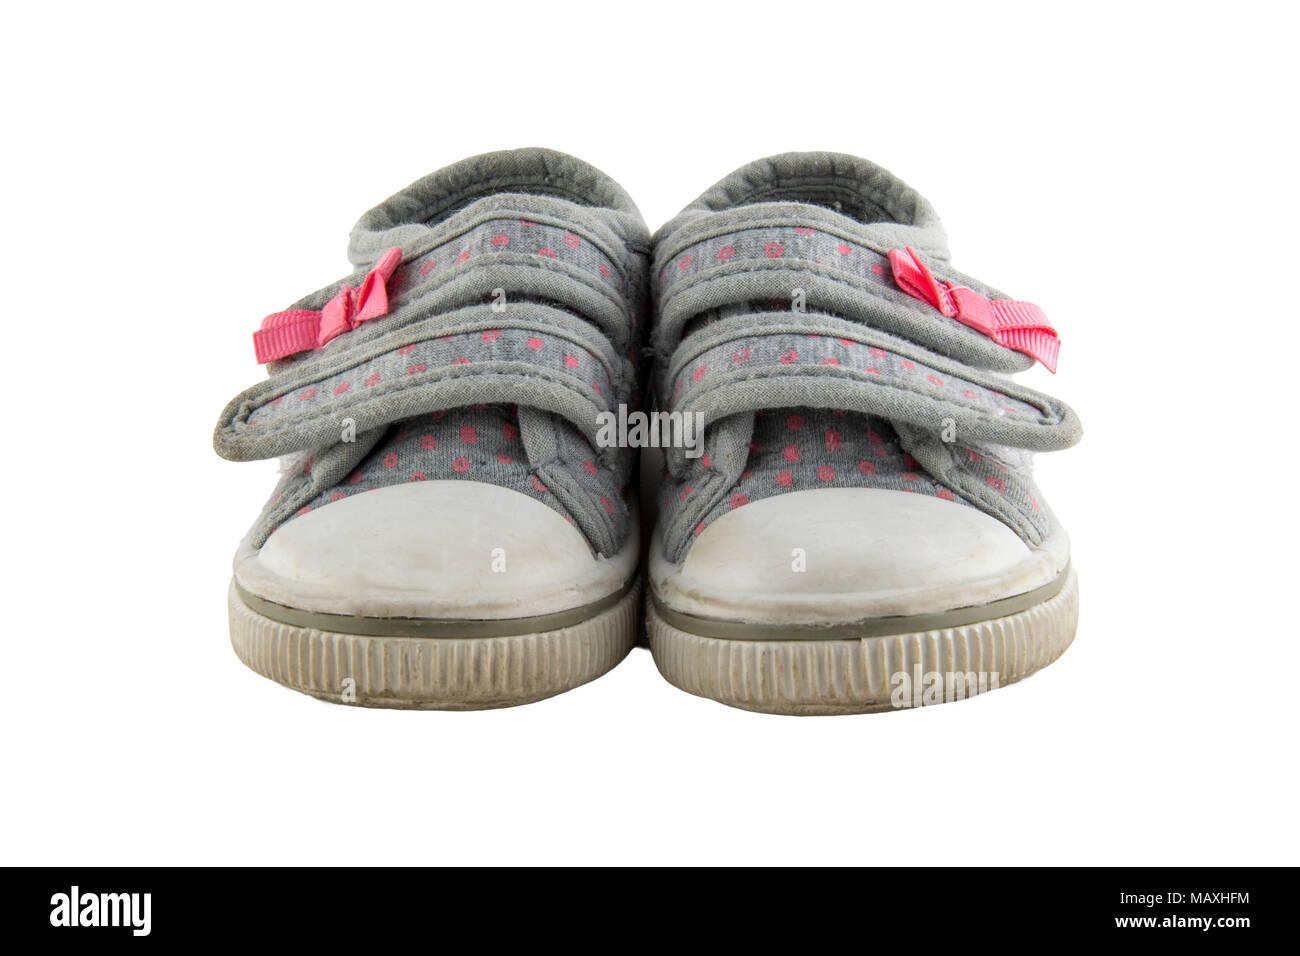 little girls shoes  isolated on white background - Stock Image